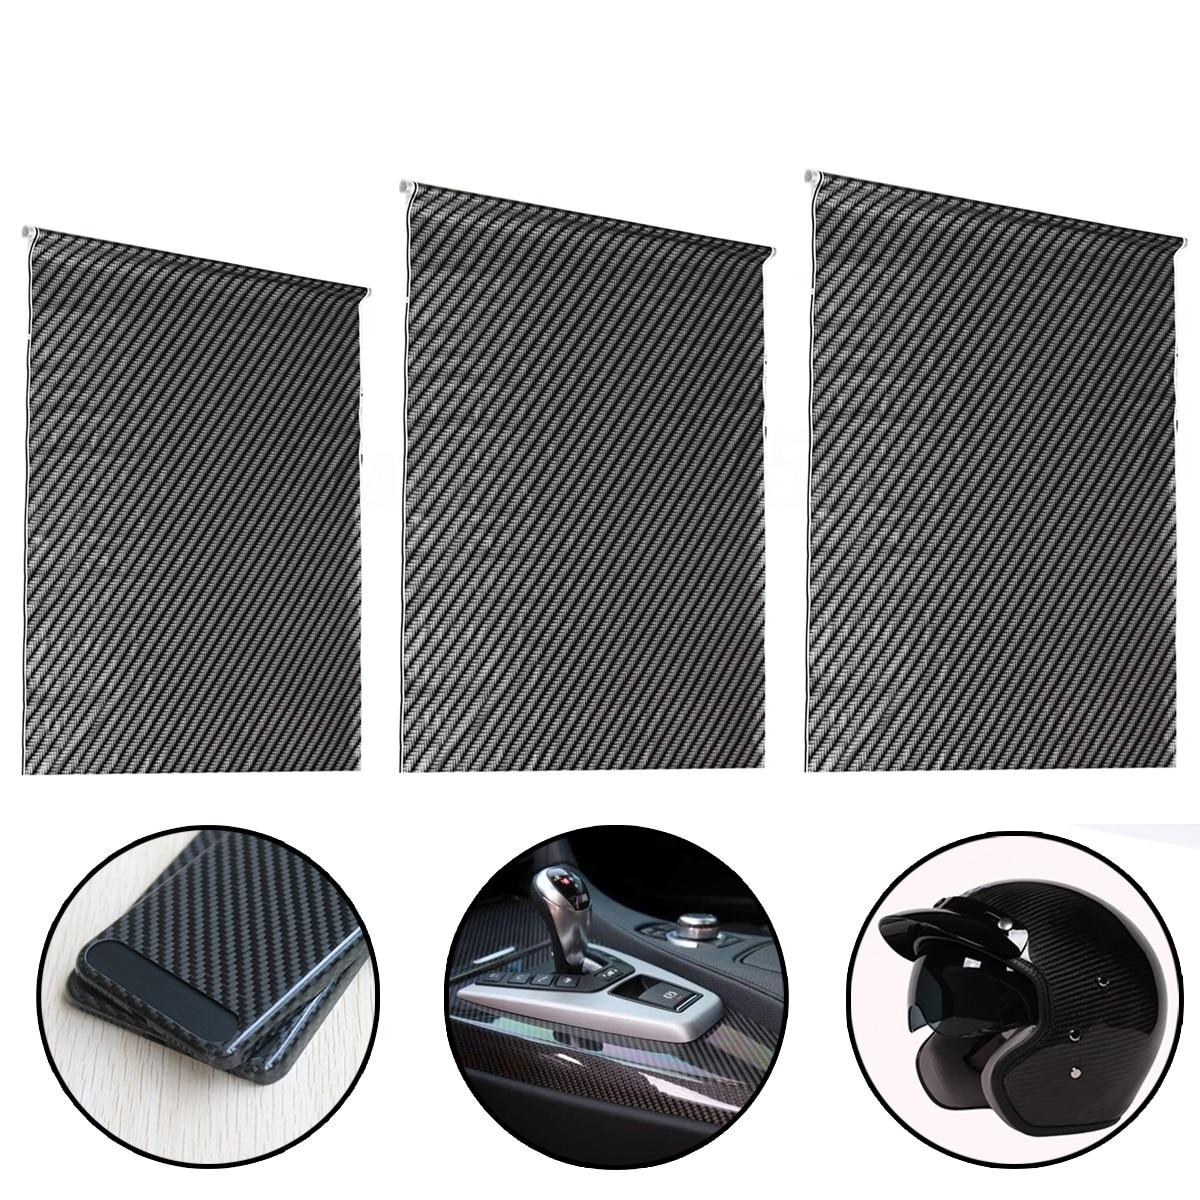 New PVA Water Transfer Printing Film Hydrographic Film Aquaprint Film Decorative Films For Household Car Decoration 50x100cm